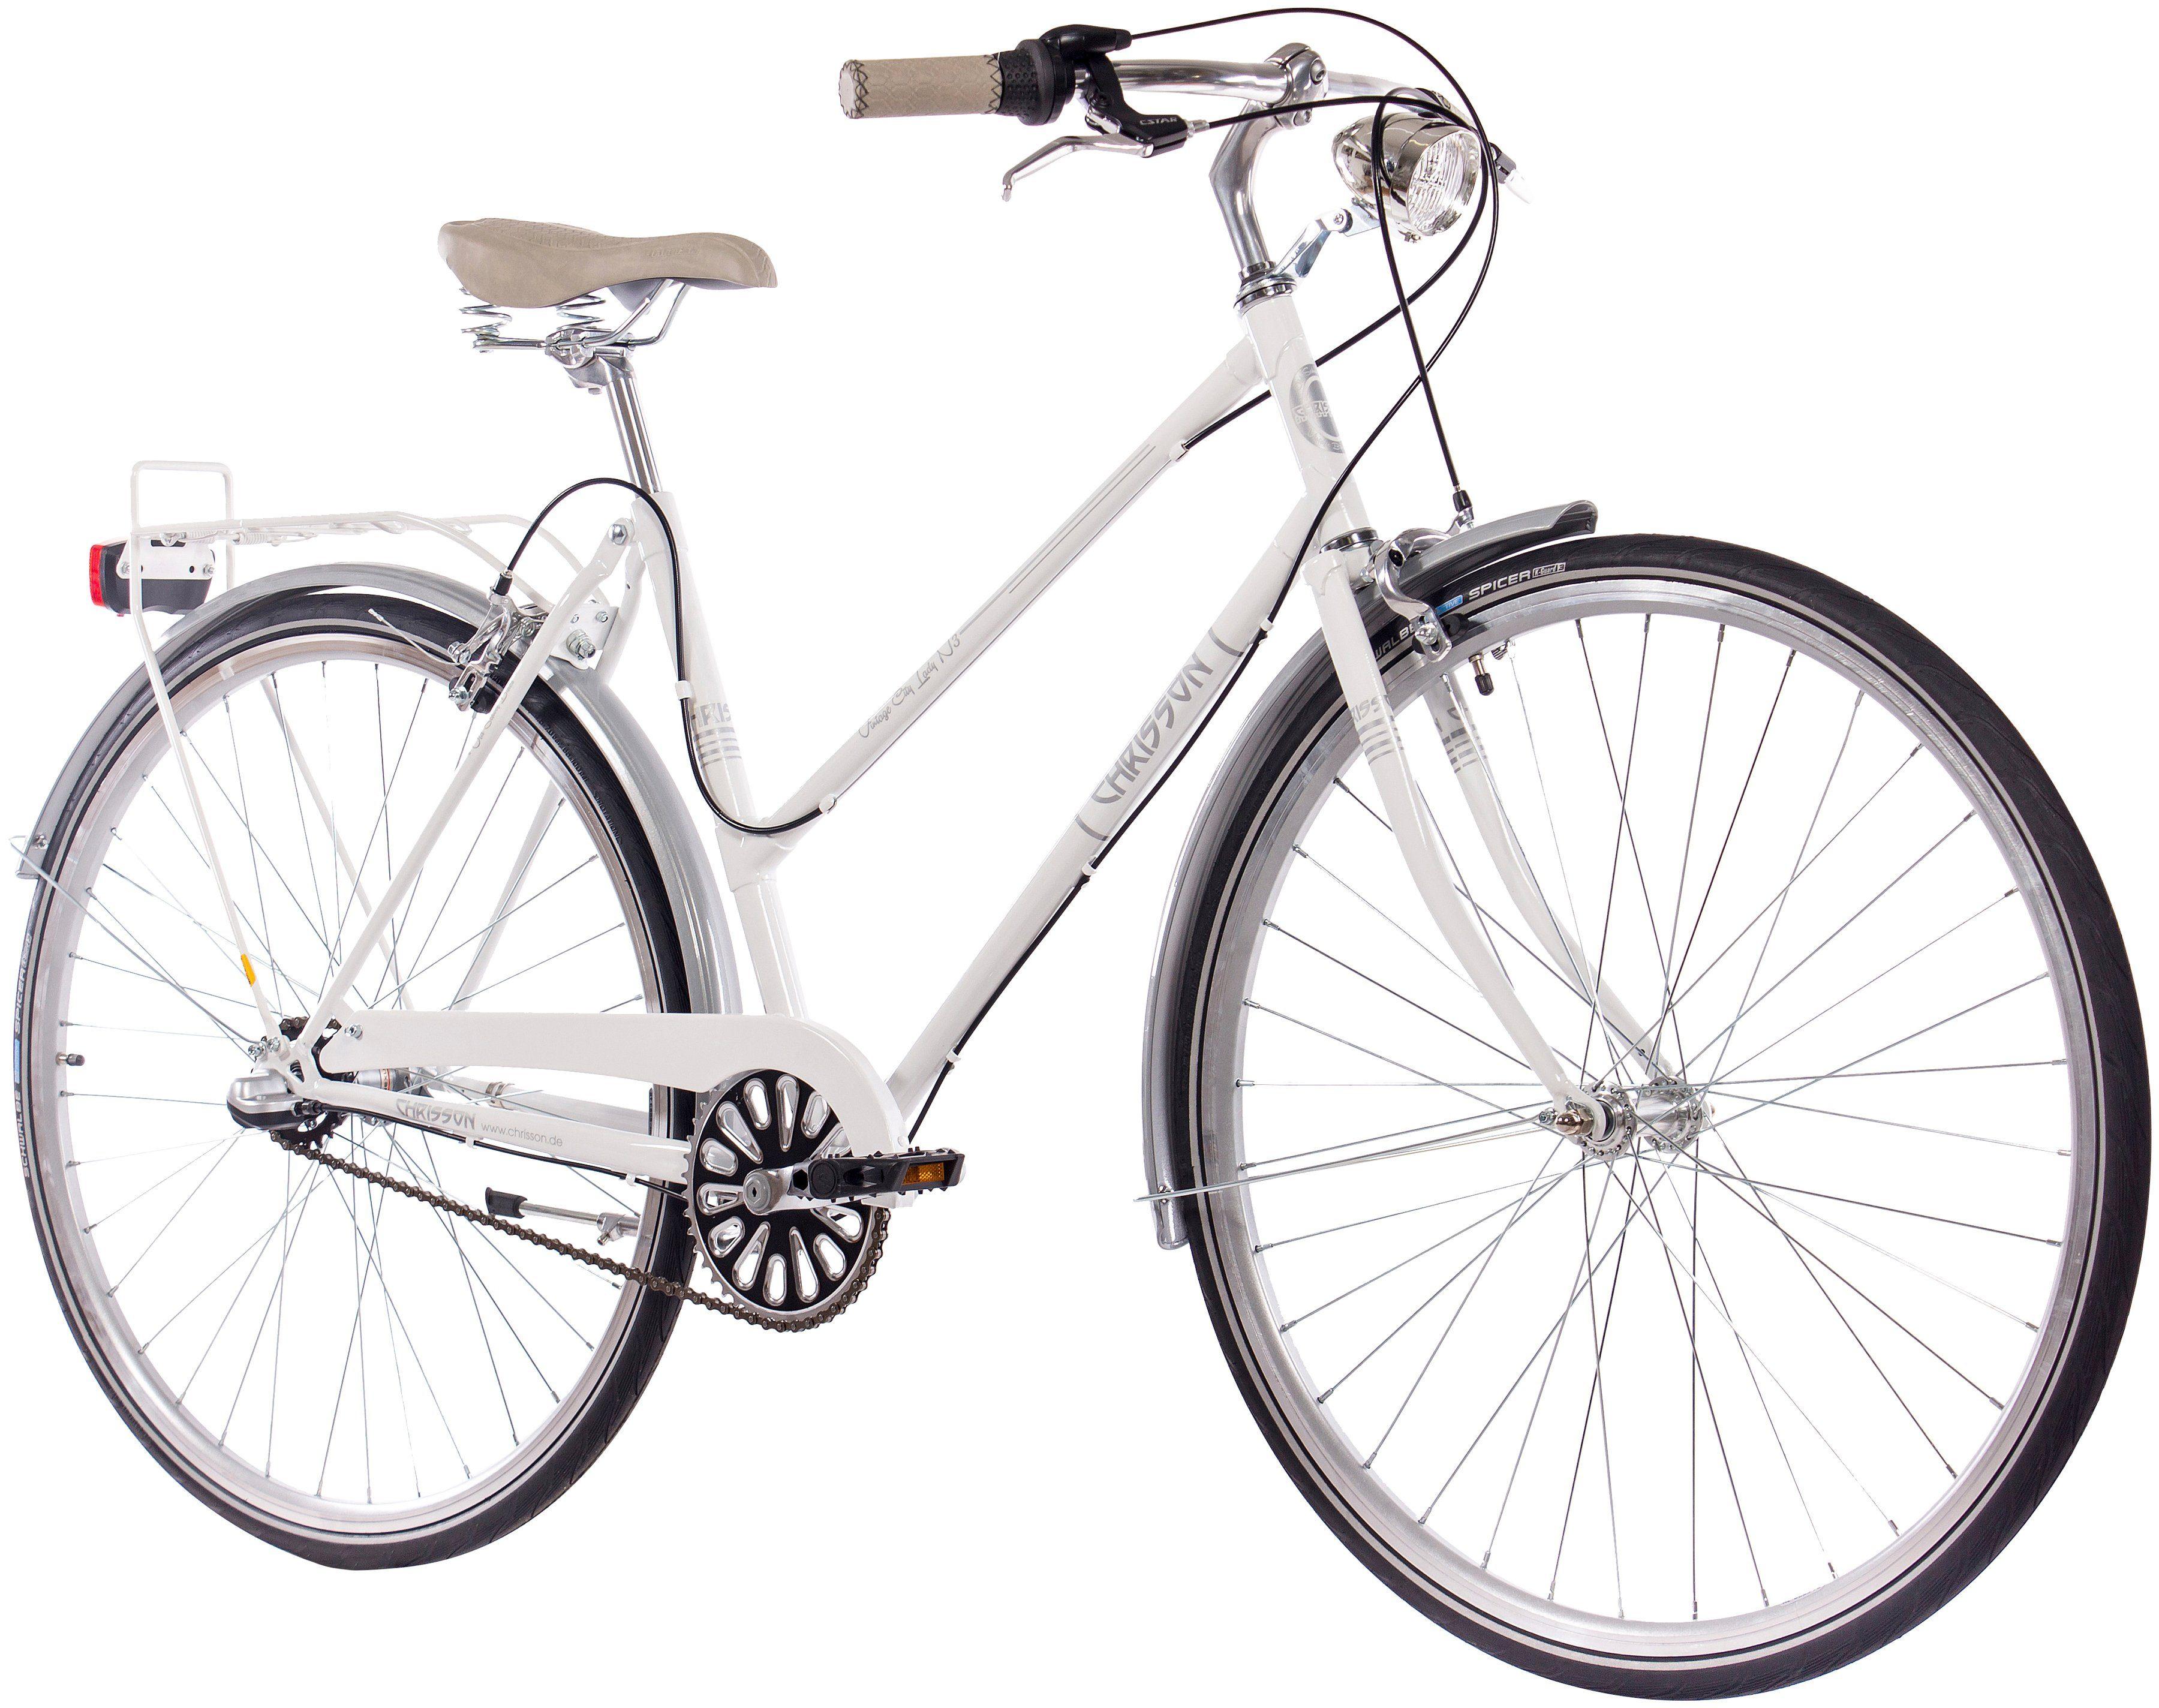 CHRISSON Citybike Damen »VINTAGE CITY LADY N3«, 28 Zoll, 3 Gang, Rücktrittbremse